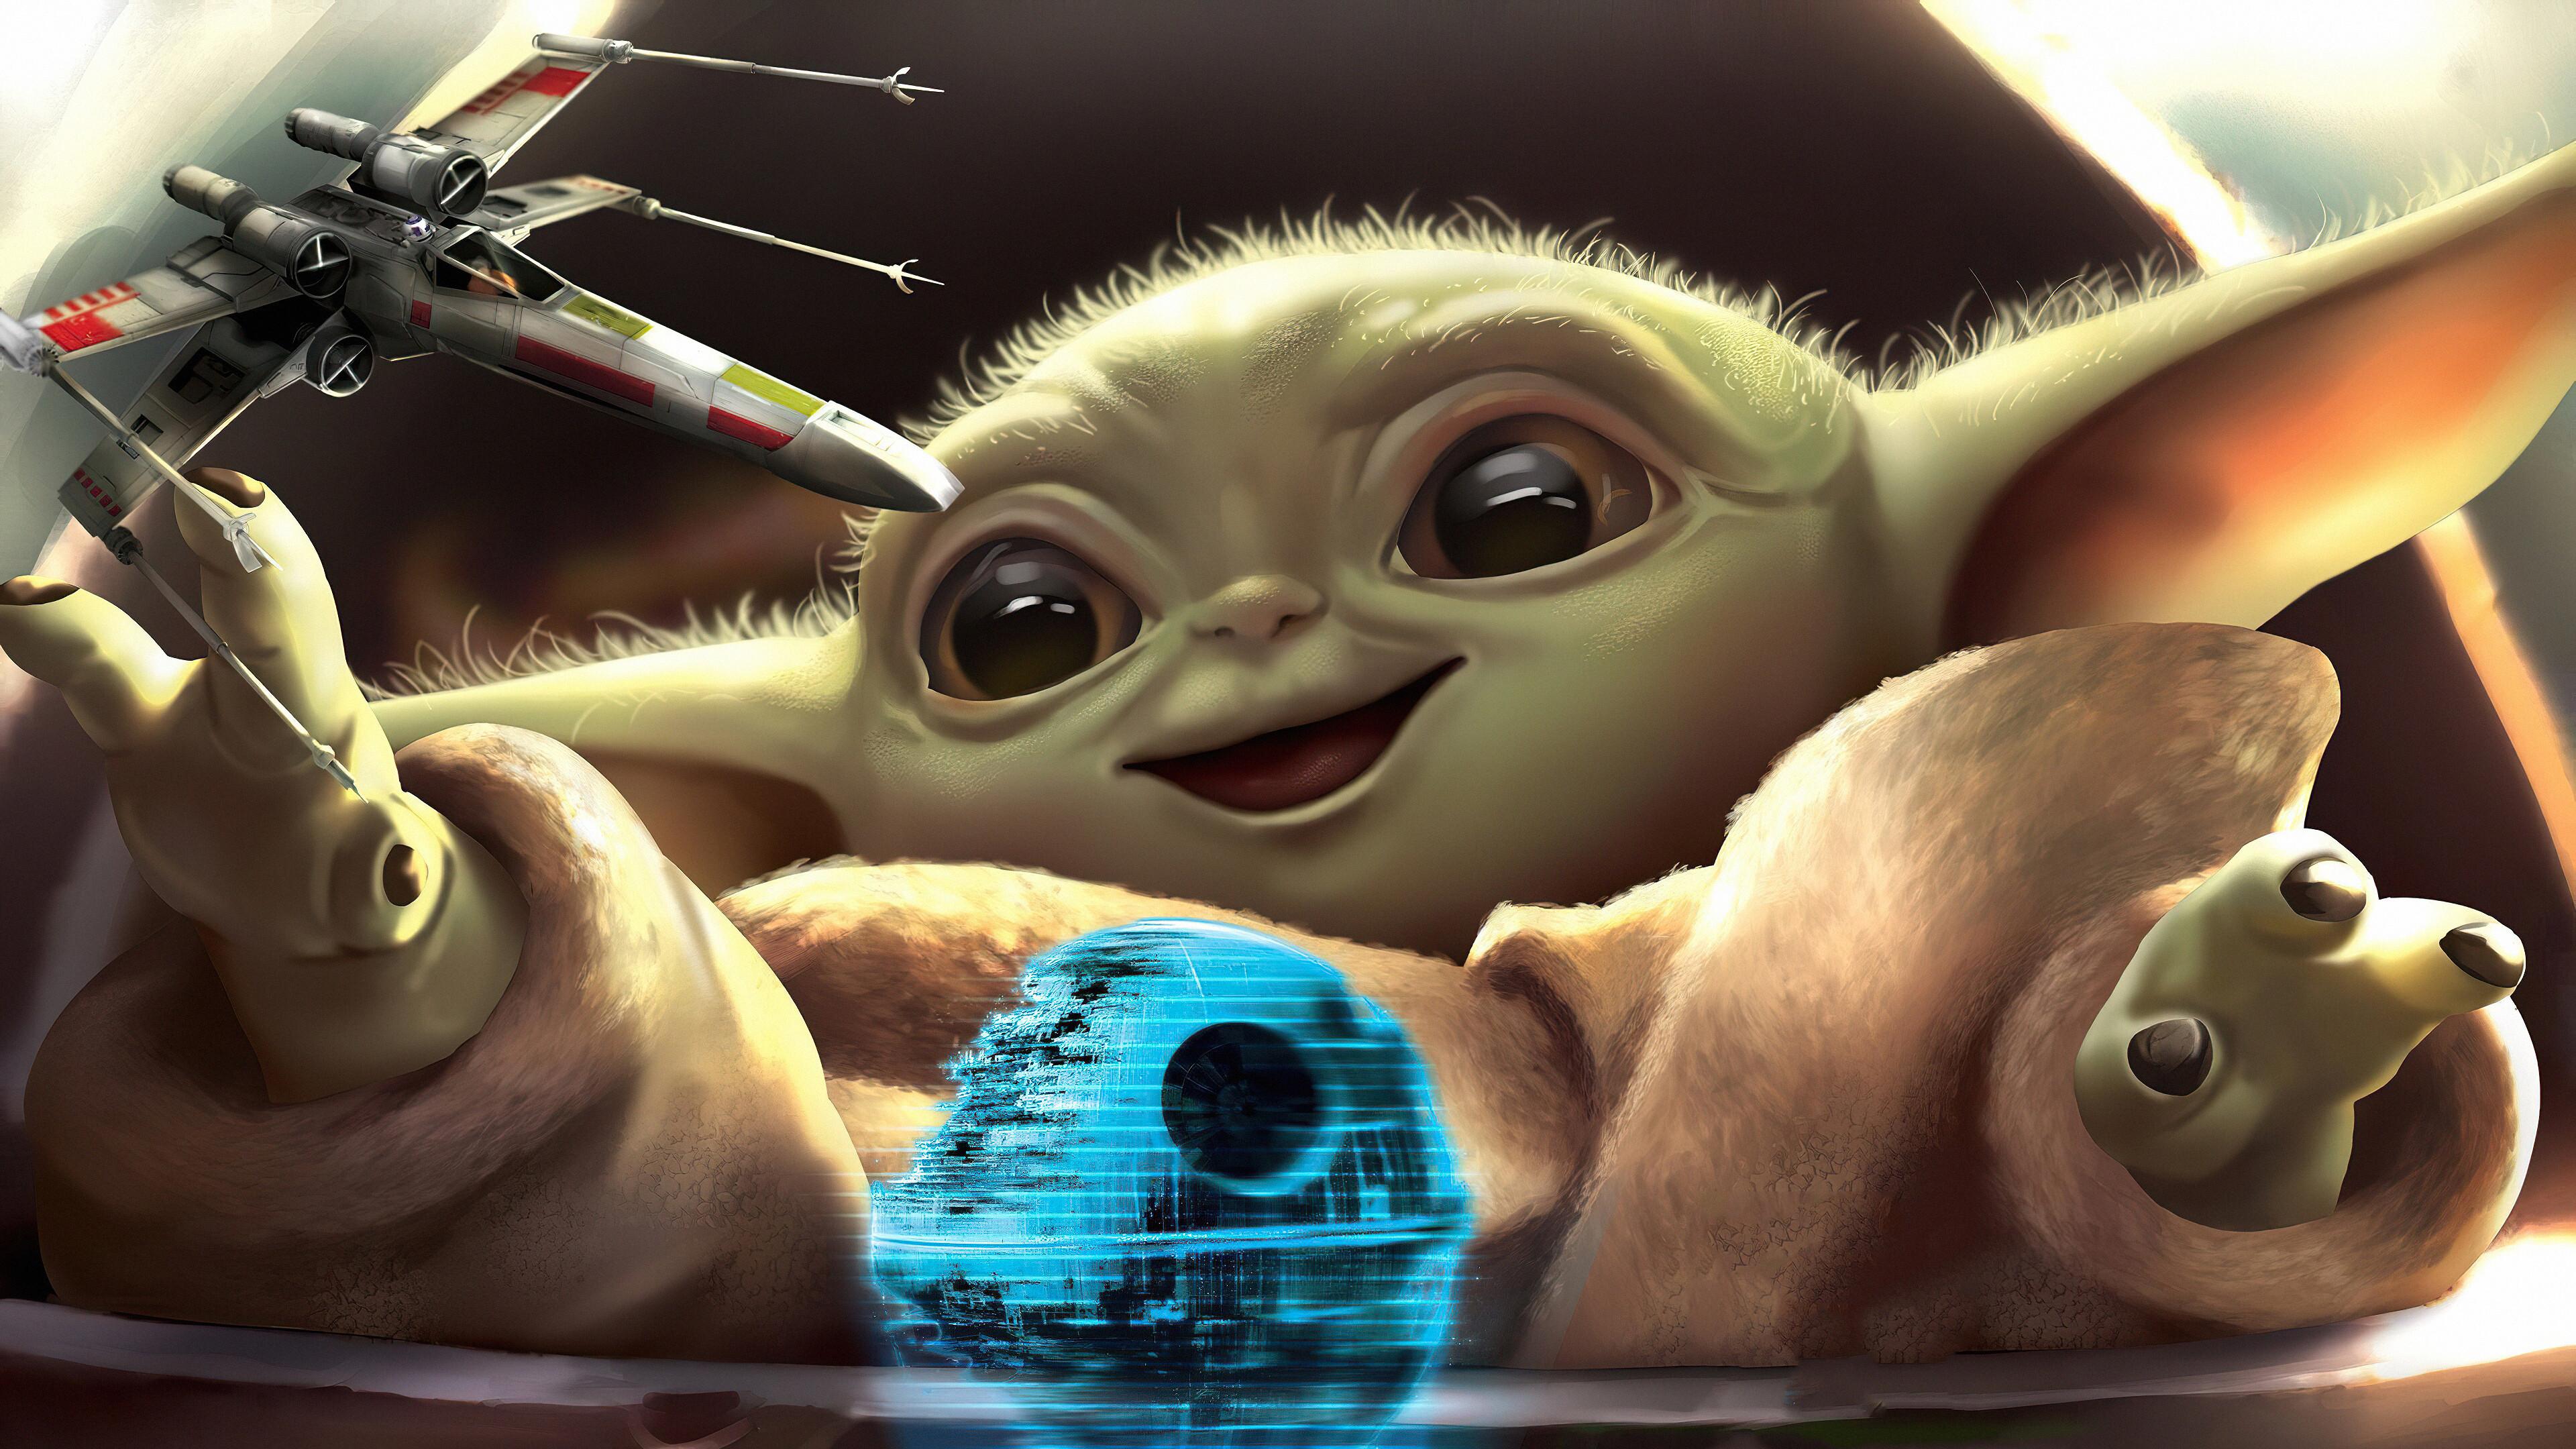 Star Wars Baby Yoda 2992849 Hd Wallpaper Backgrounds Download